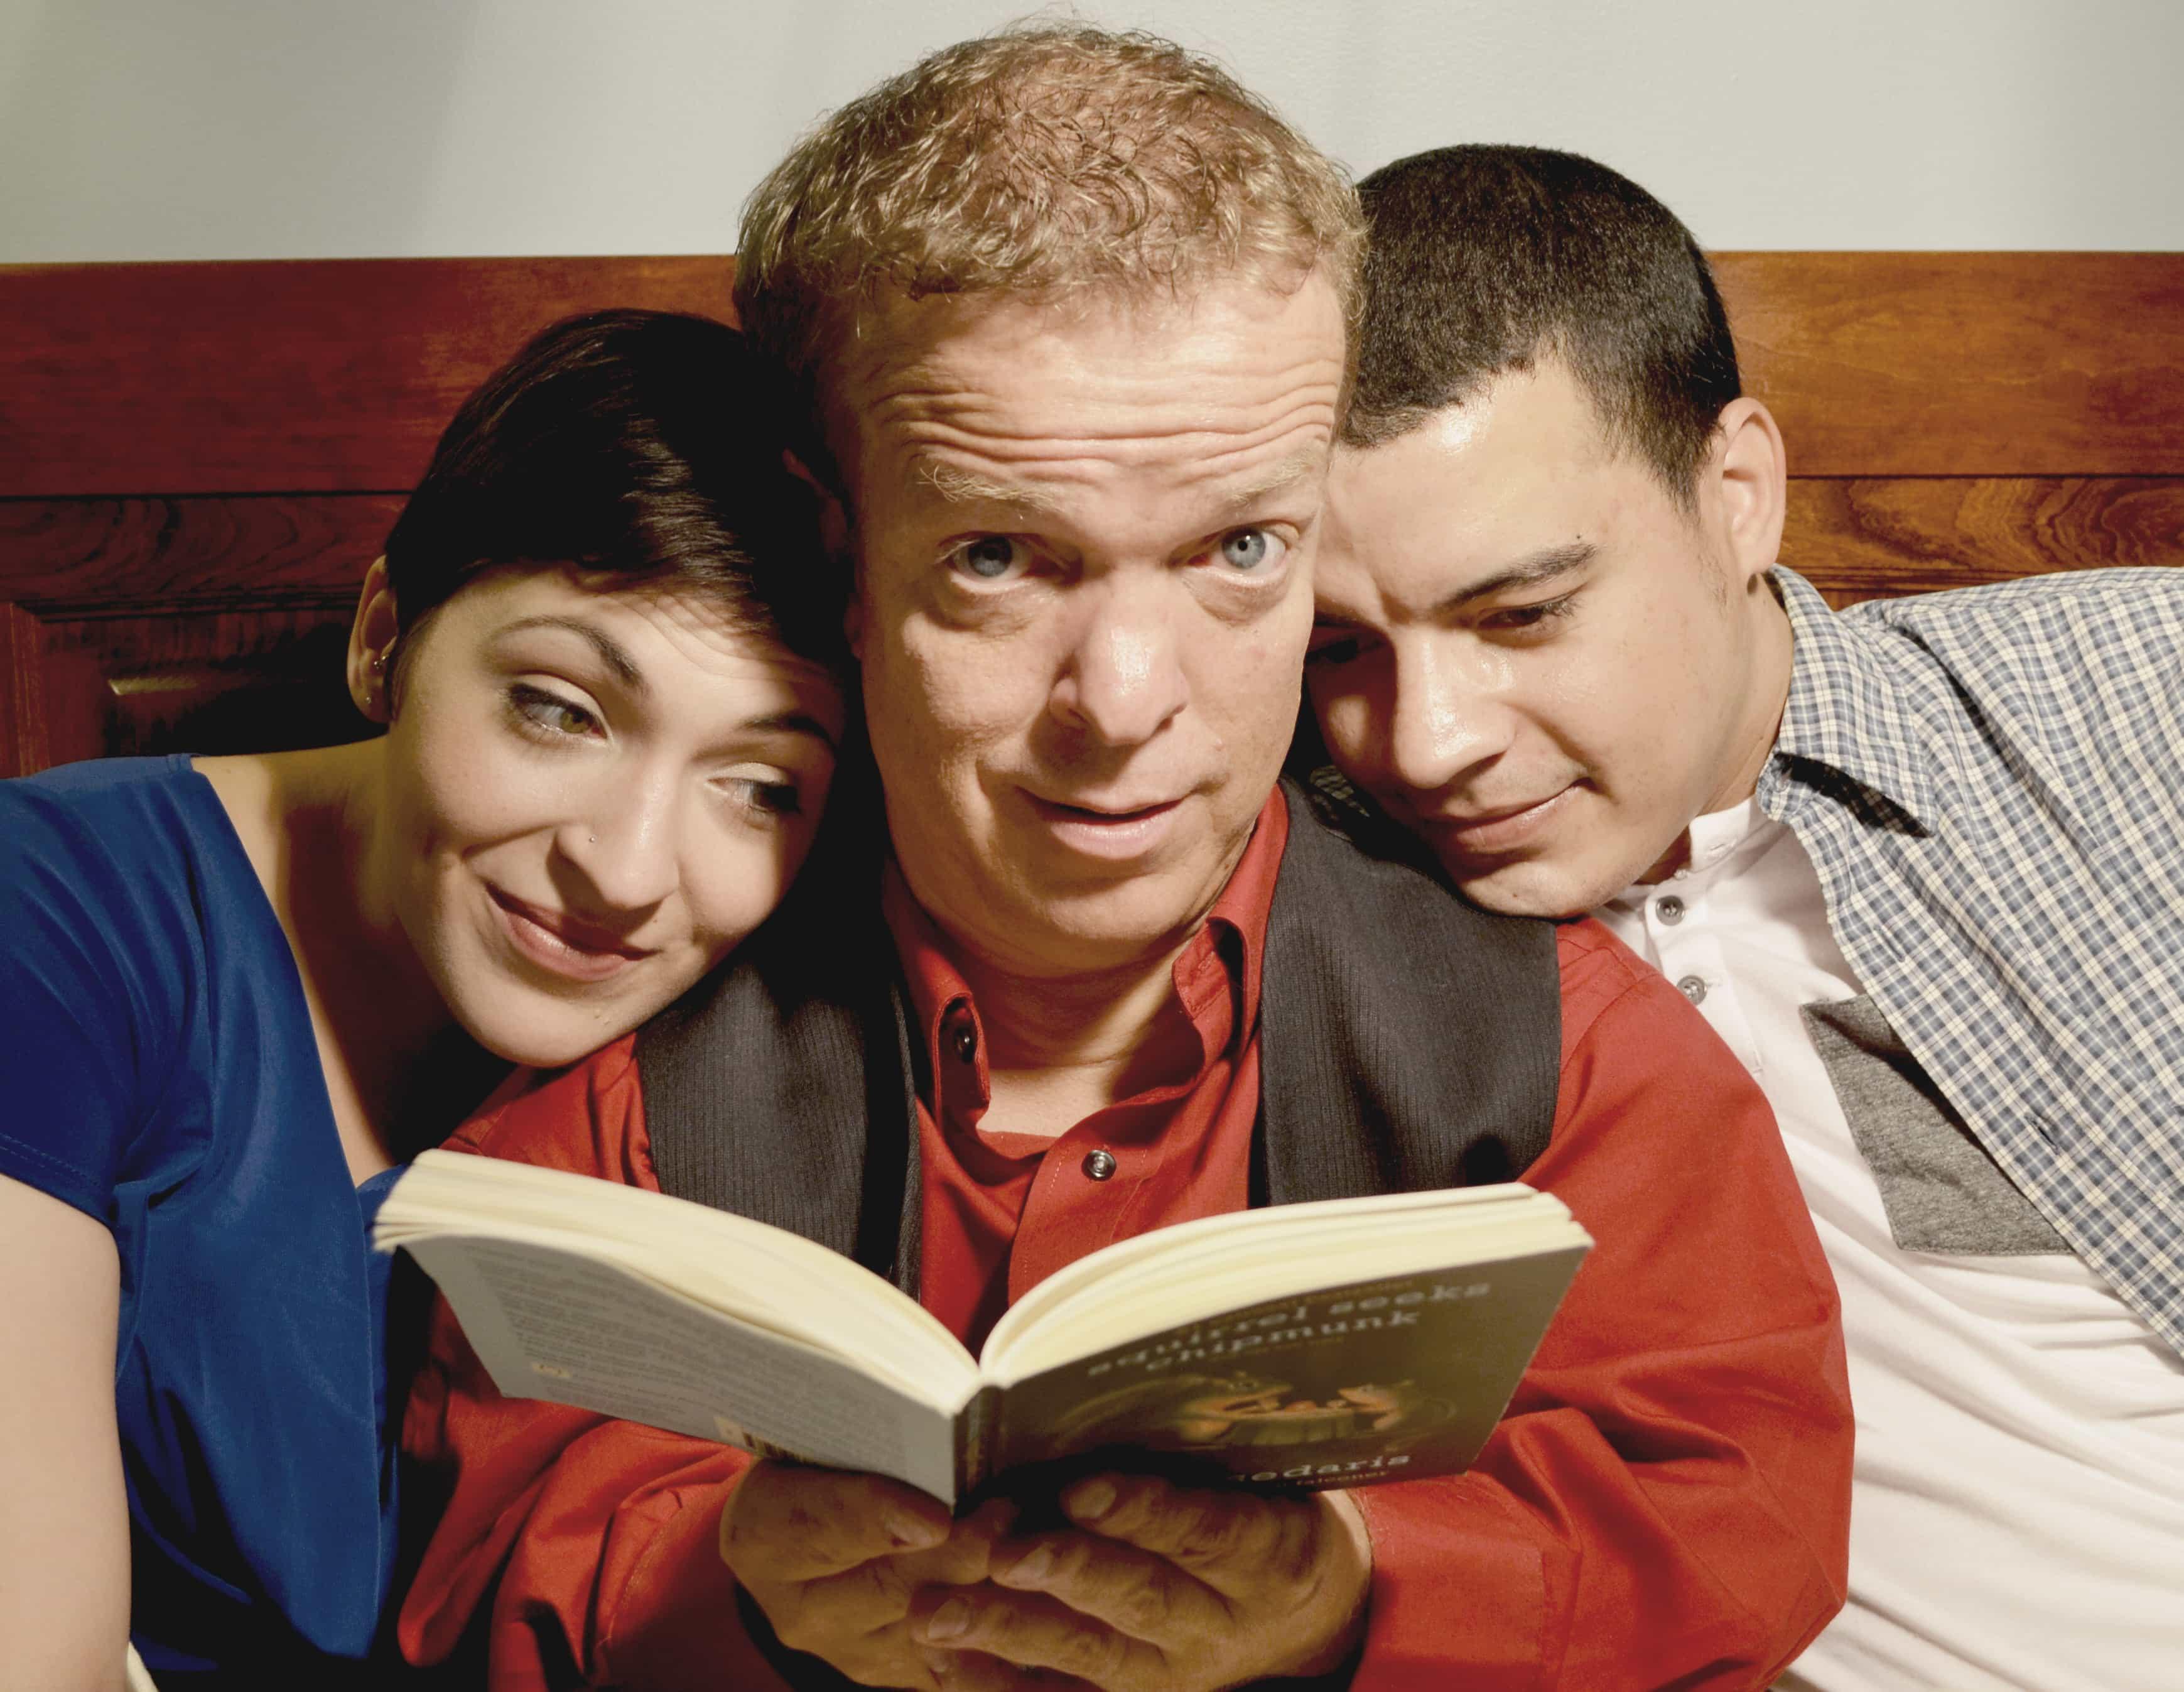 Briana Manente (Dori), Scott Strasbaugh (Danny), and Justus Hammond (Gabe). Photo by David Lewis.